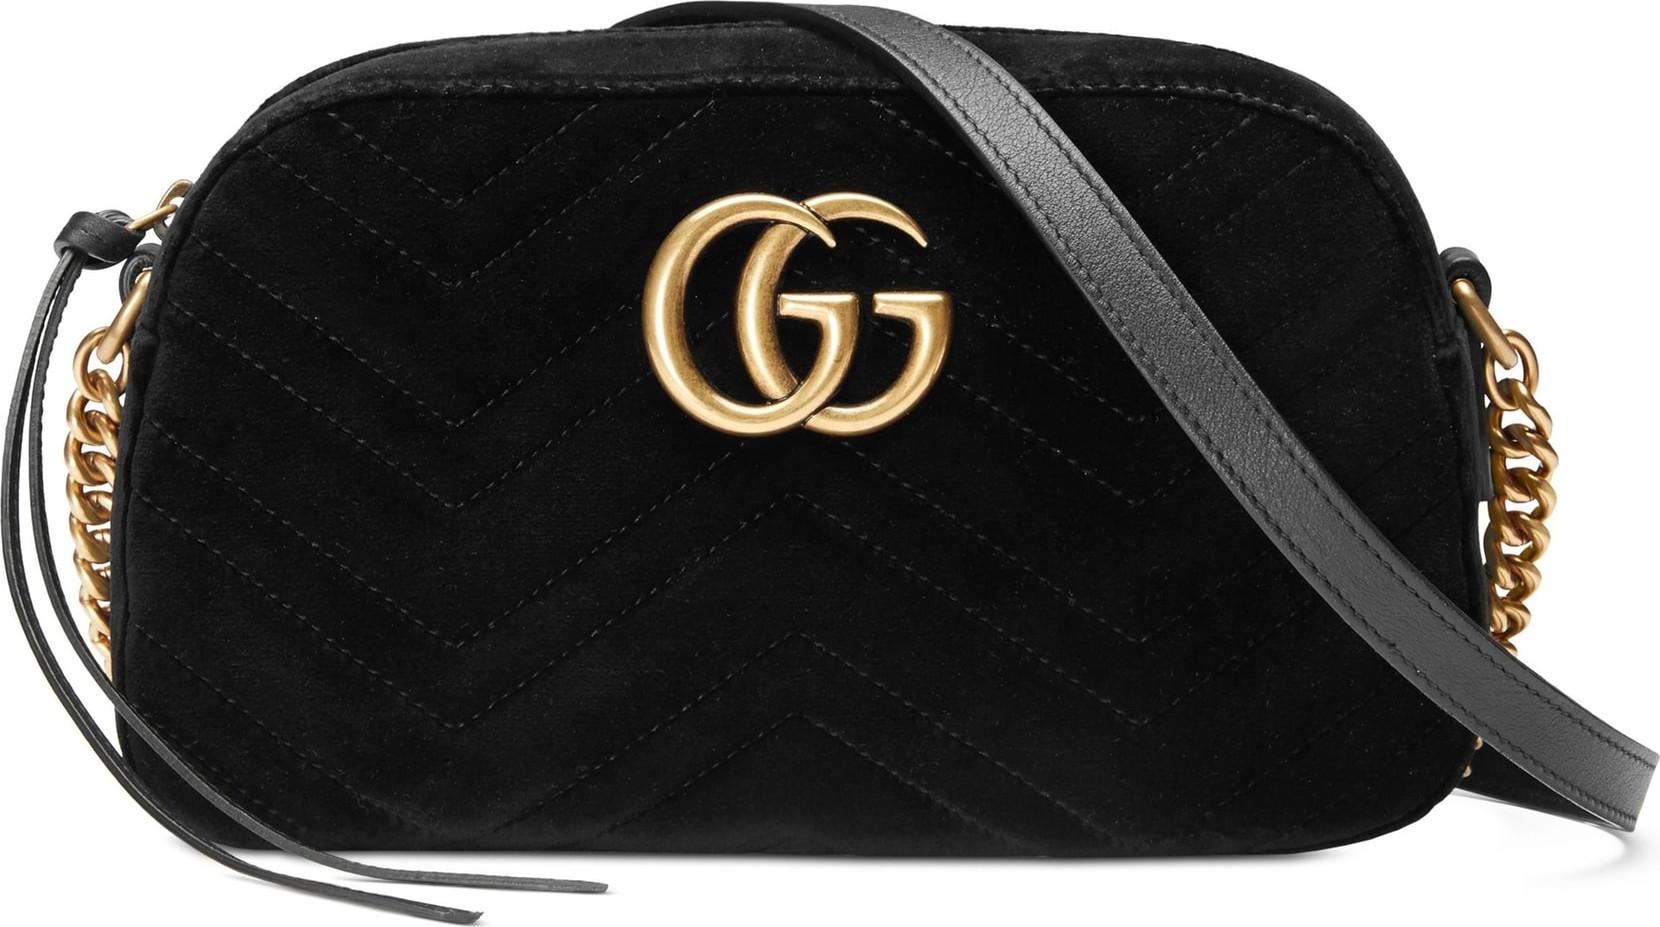 c5f4262c781 Gucci Small GG Marmont 2.0 Matelassé Velvet Shoulder Bag - Mkt